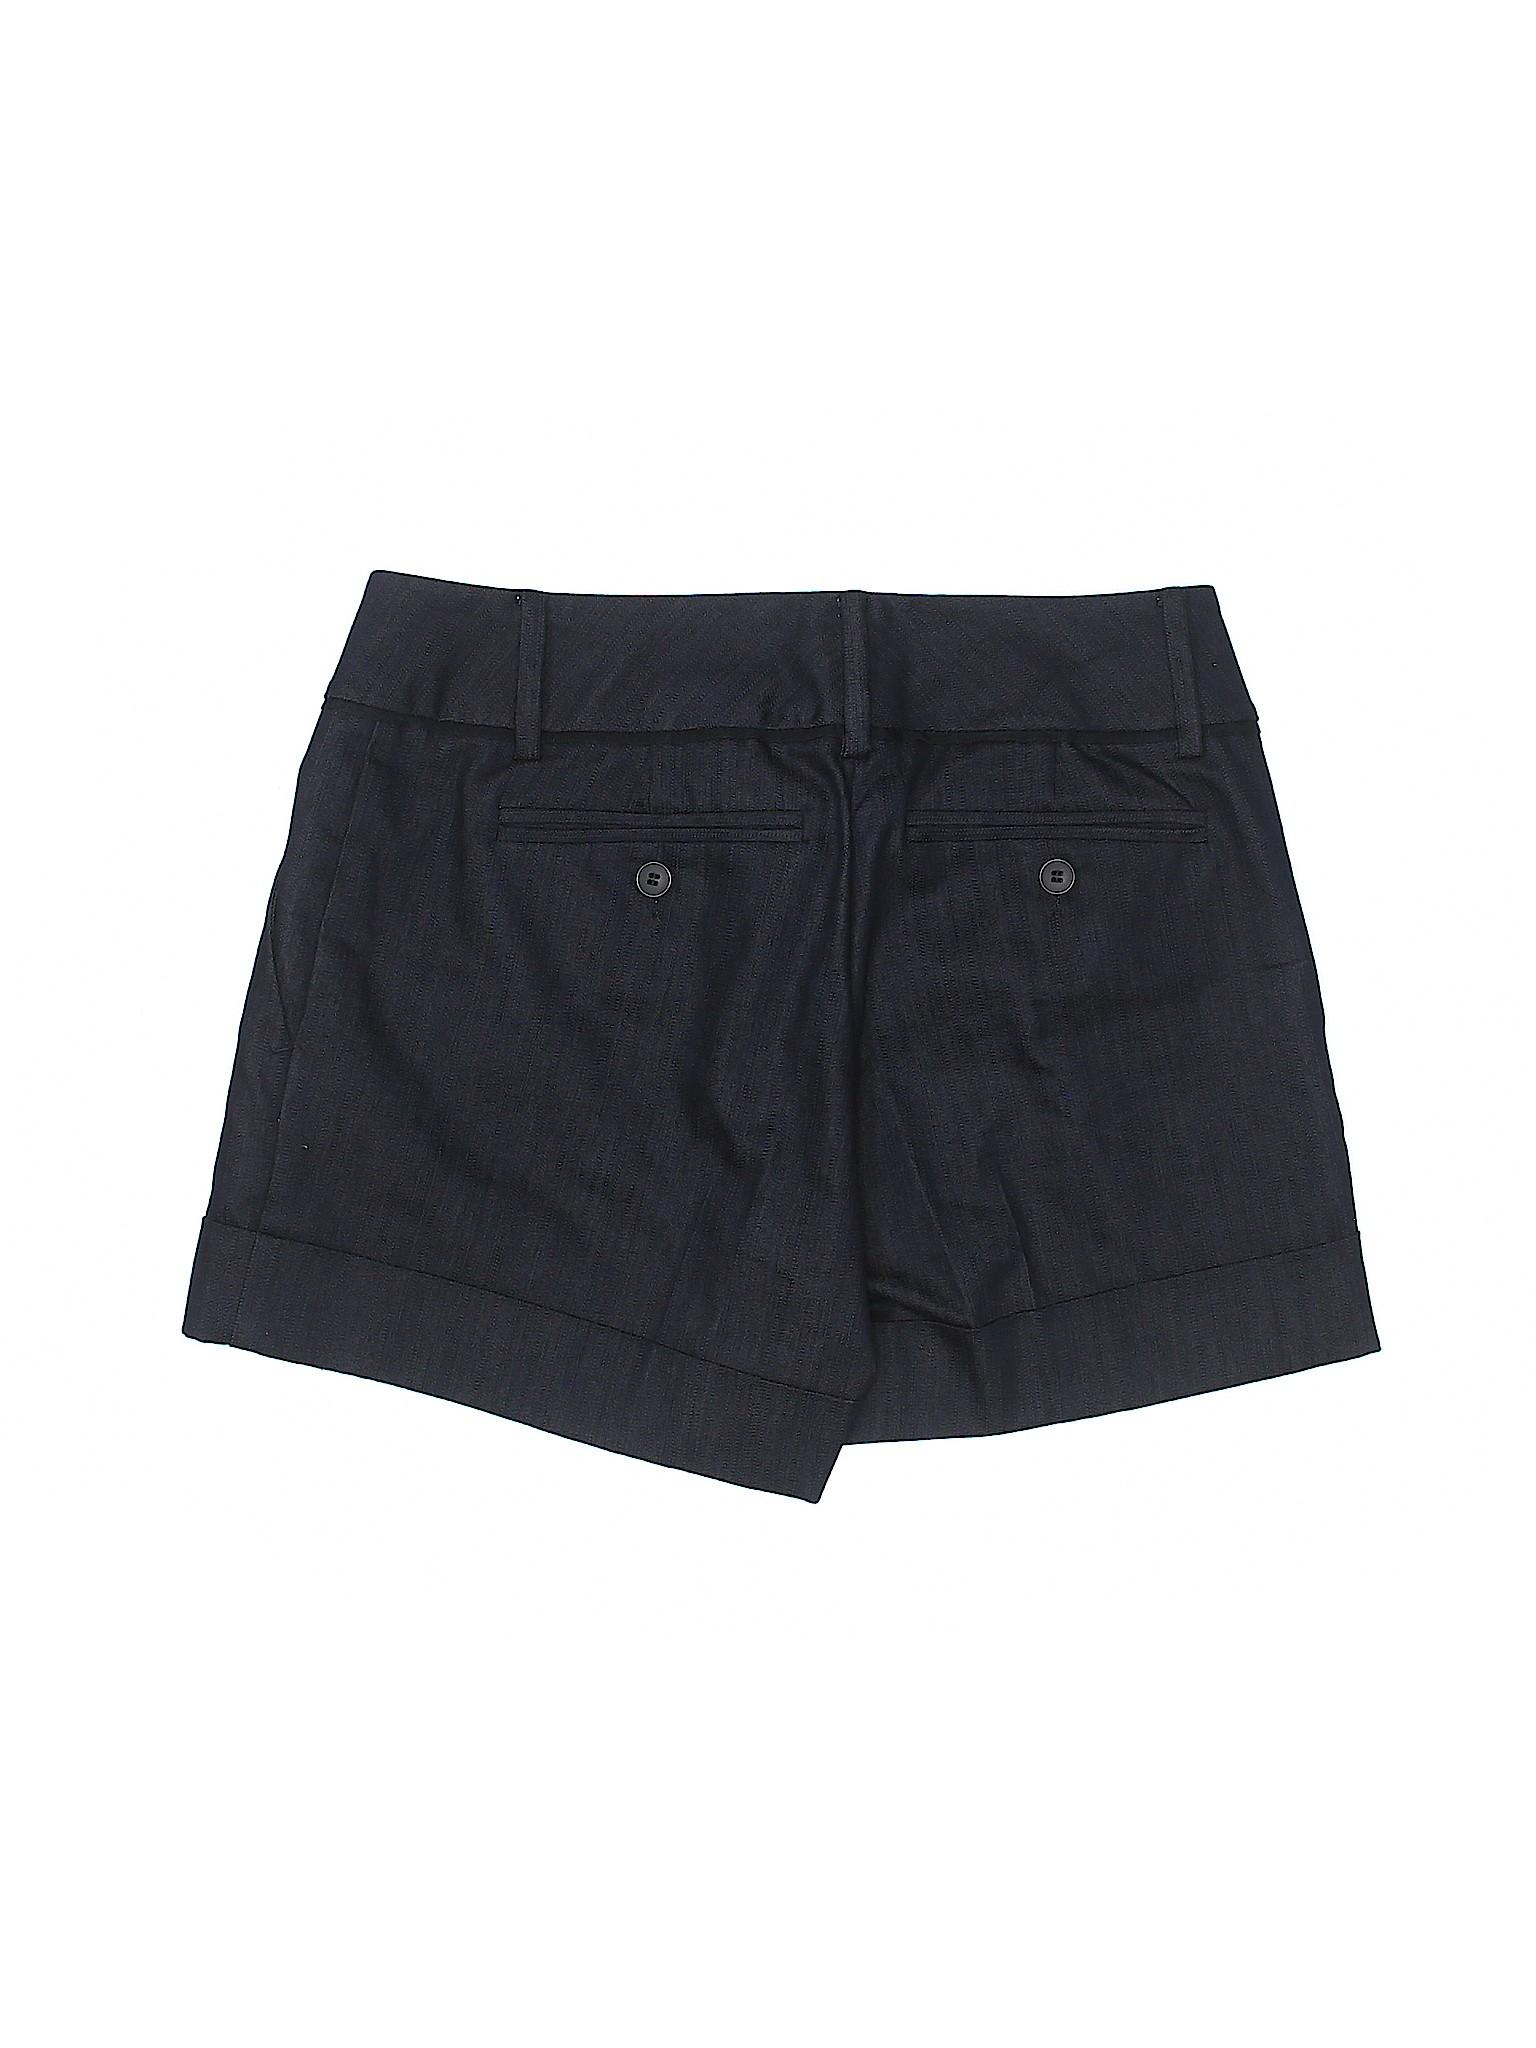 New Avenue Denim Studio Boutique amp; leisure Shorts Company York Design 7th HqwaEX